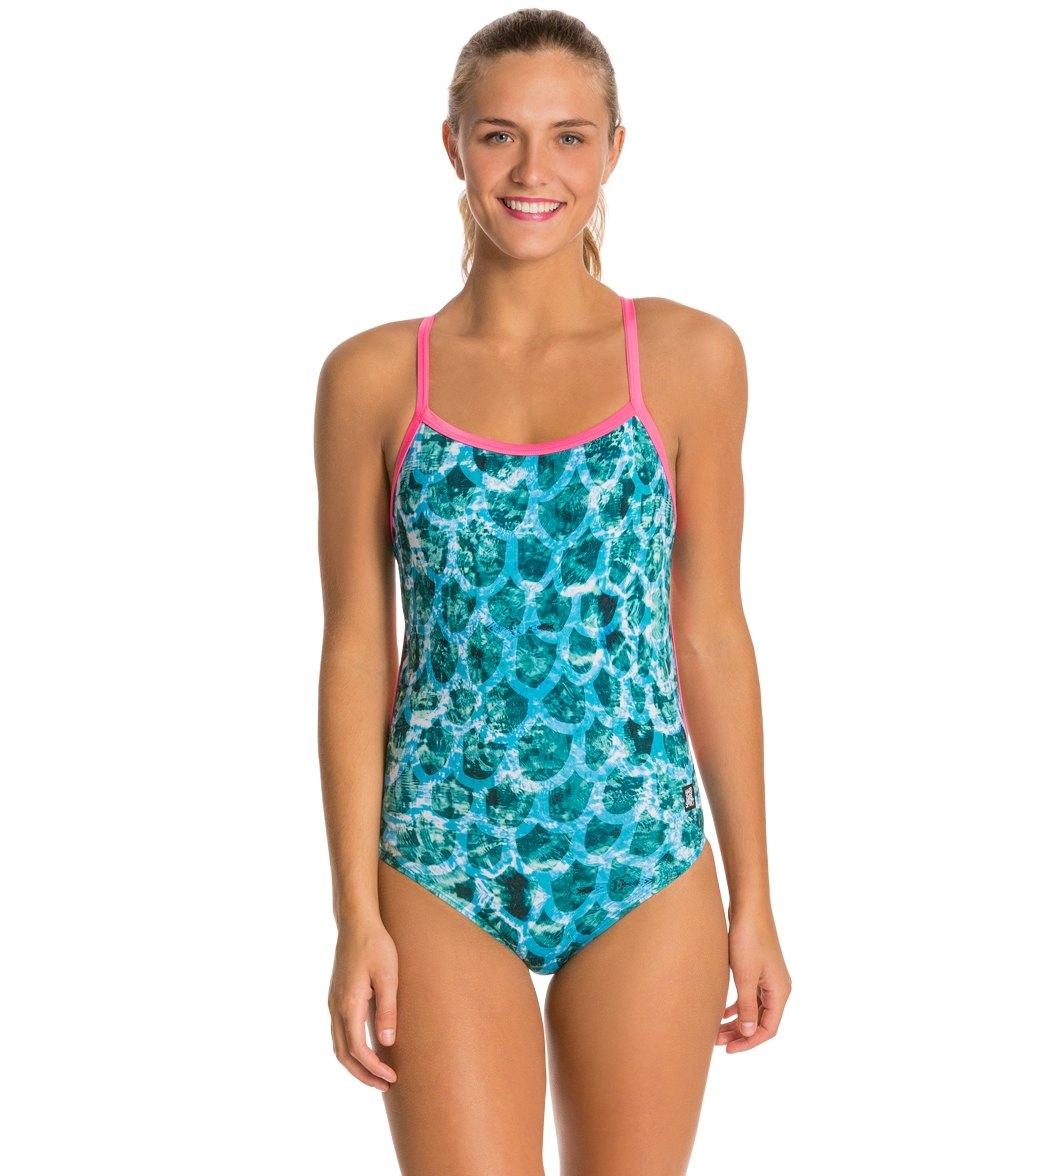 Hardcoresport Women's Mermaid Cali Back One Piece Swimsuit